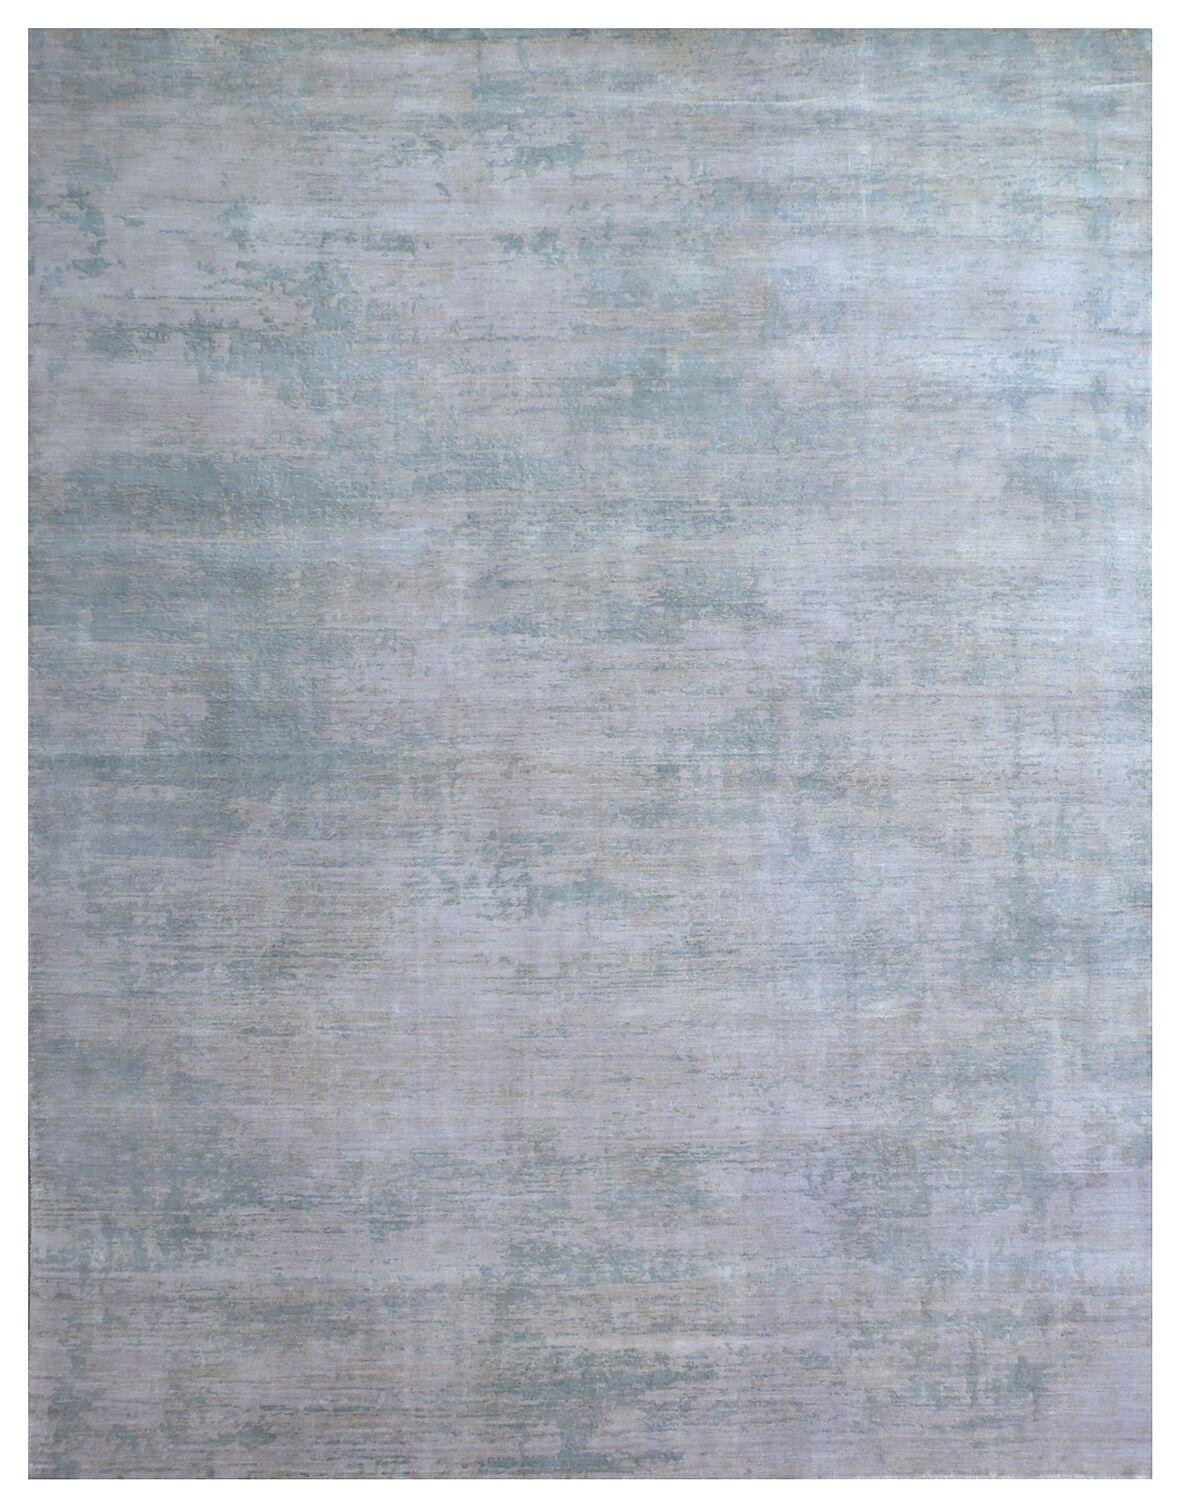 Enzo Hand-Woven Gray Area Rug Rug Size: Rectangle 8' x 10'